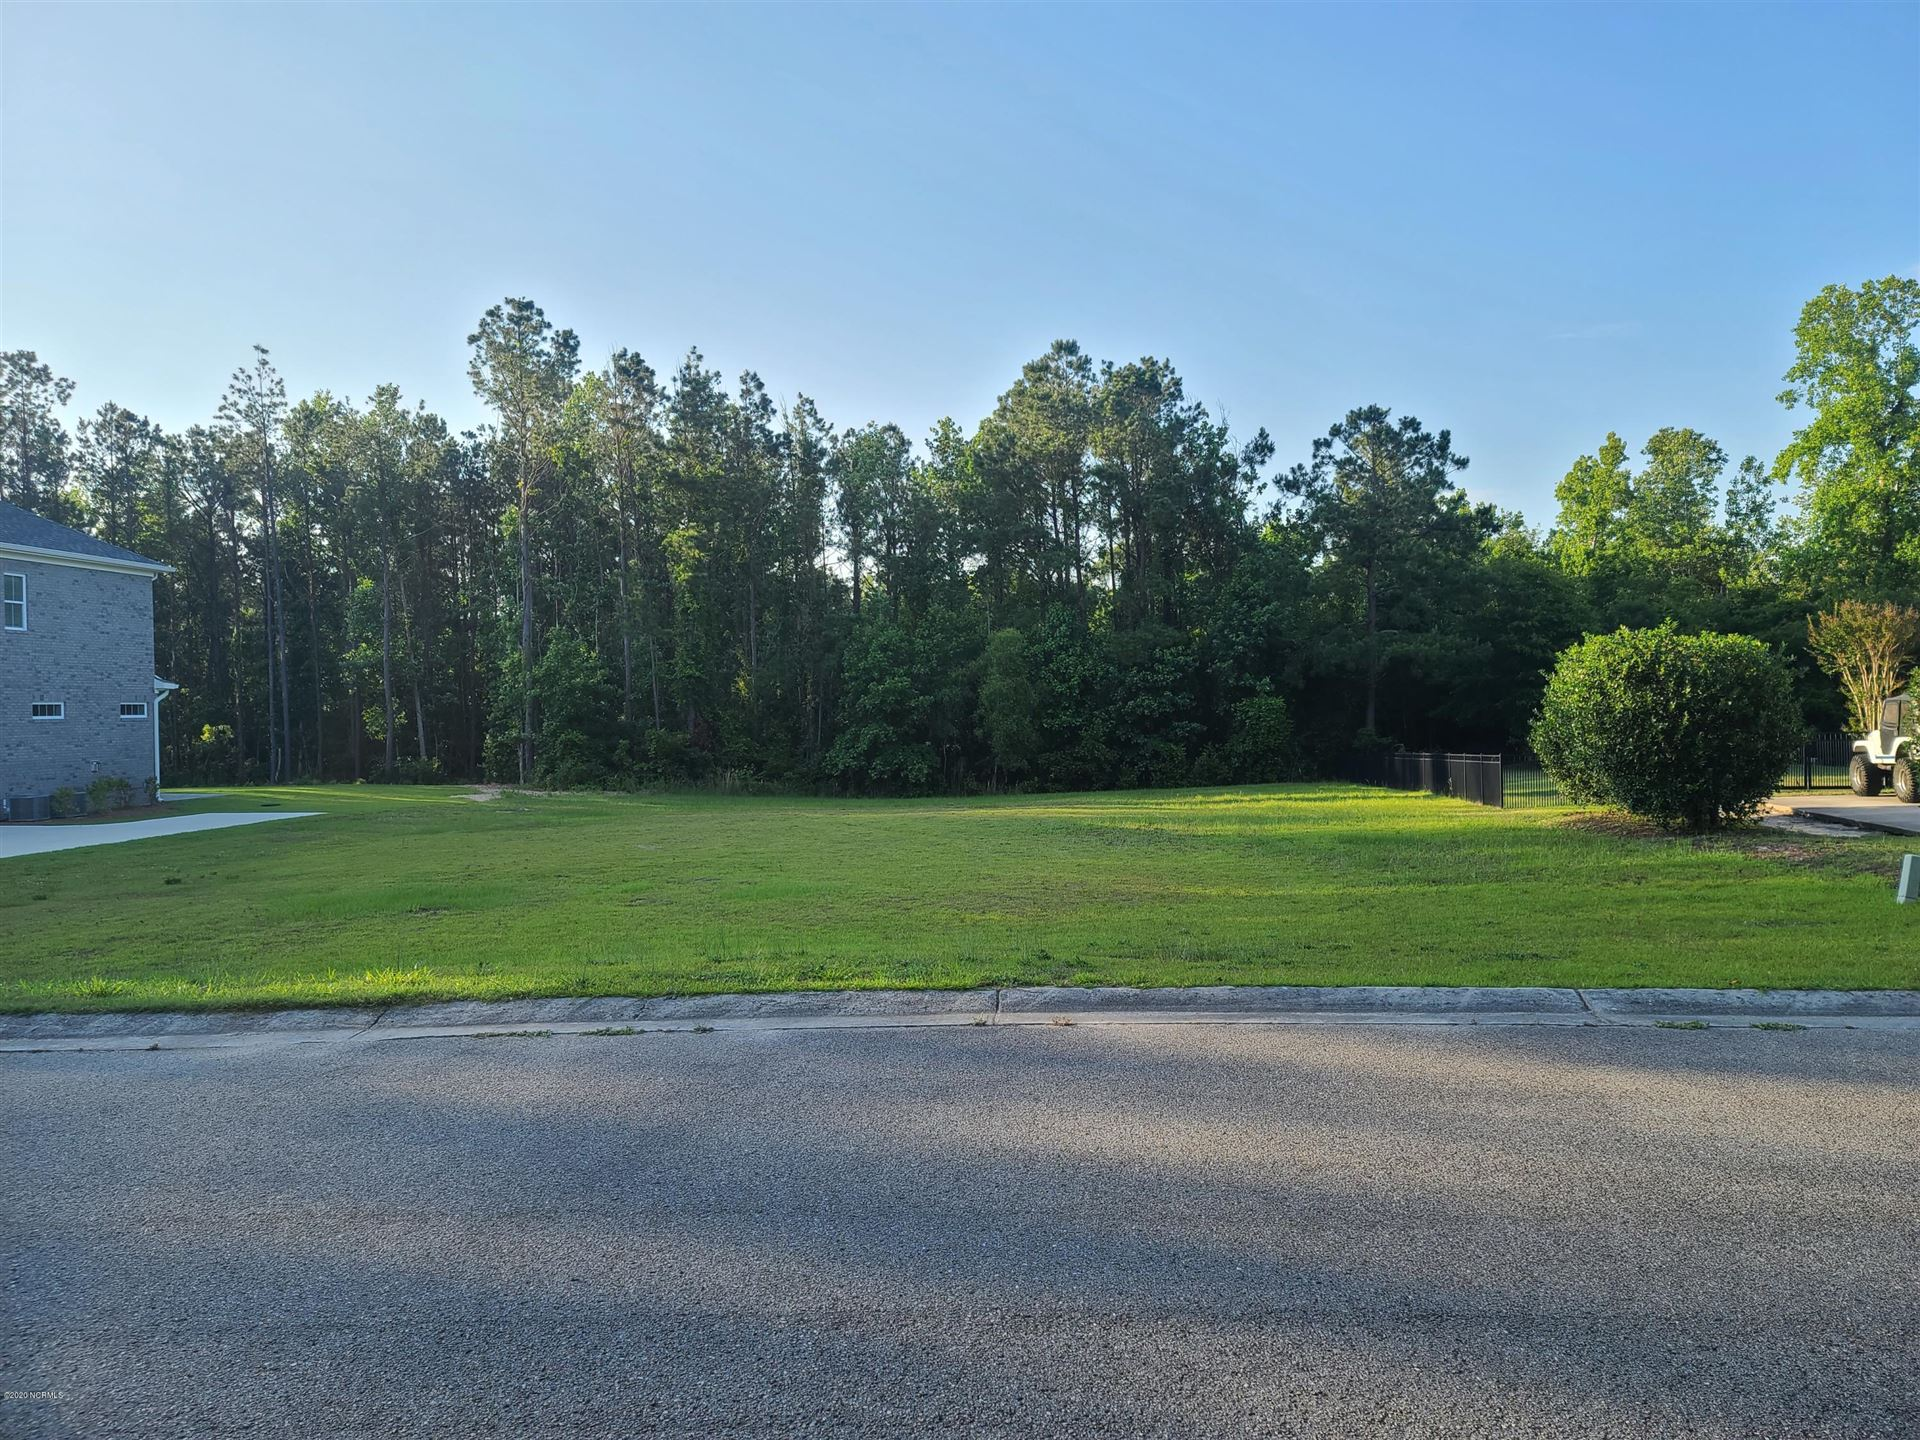 Photo of Lot 65 Navigator Drive, Hampstead, NC 28443 (MLS # 100221666)